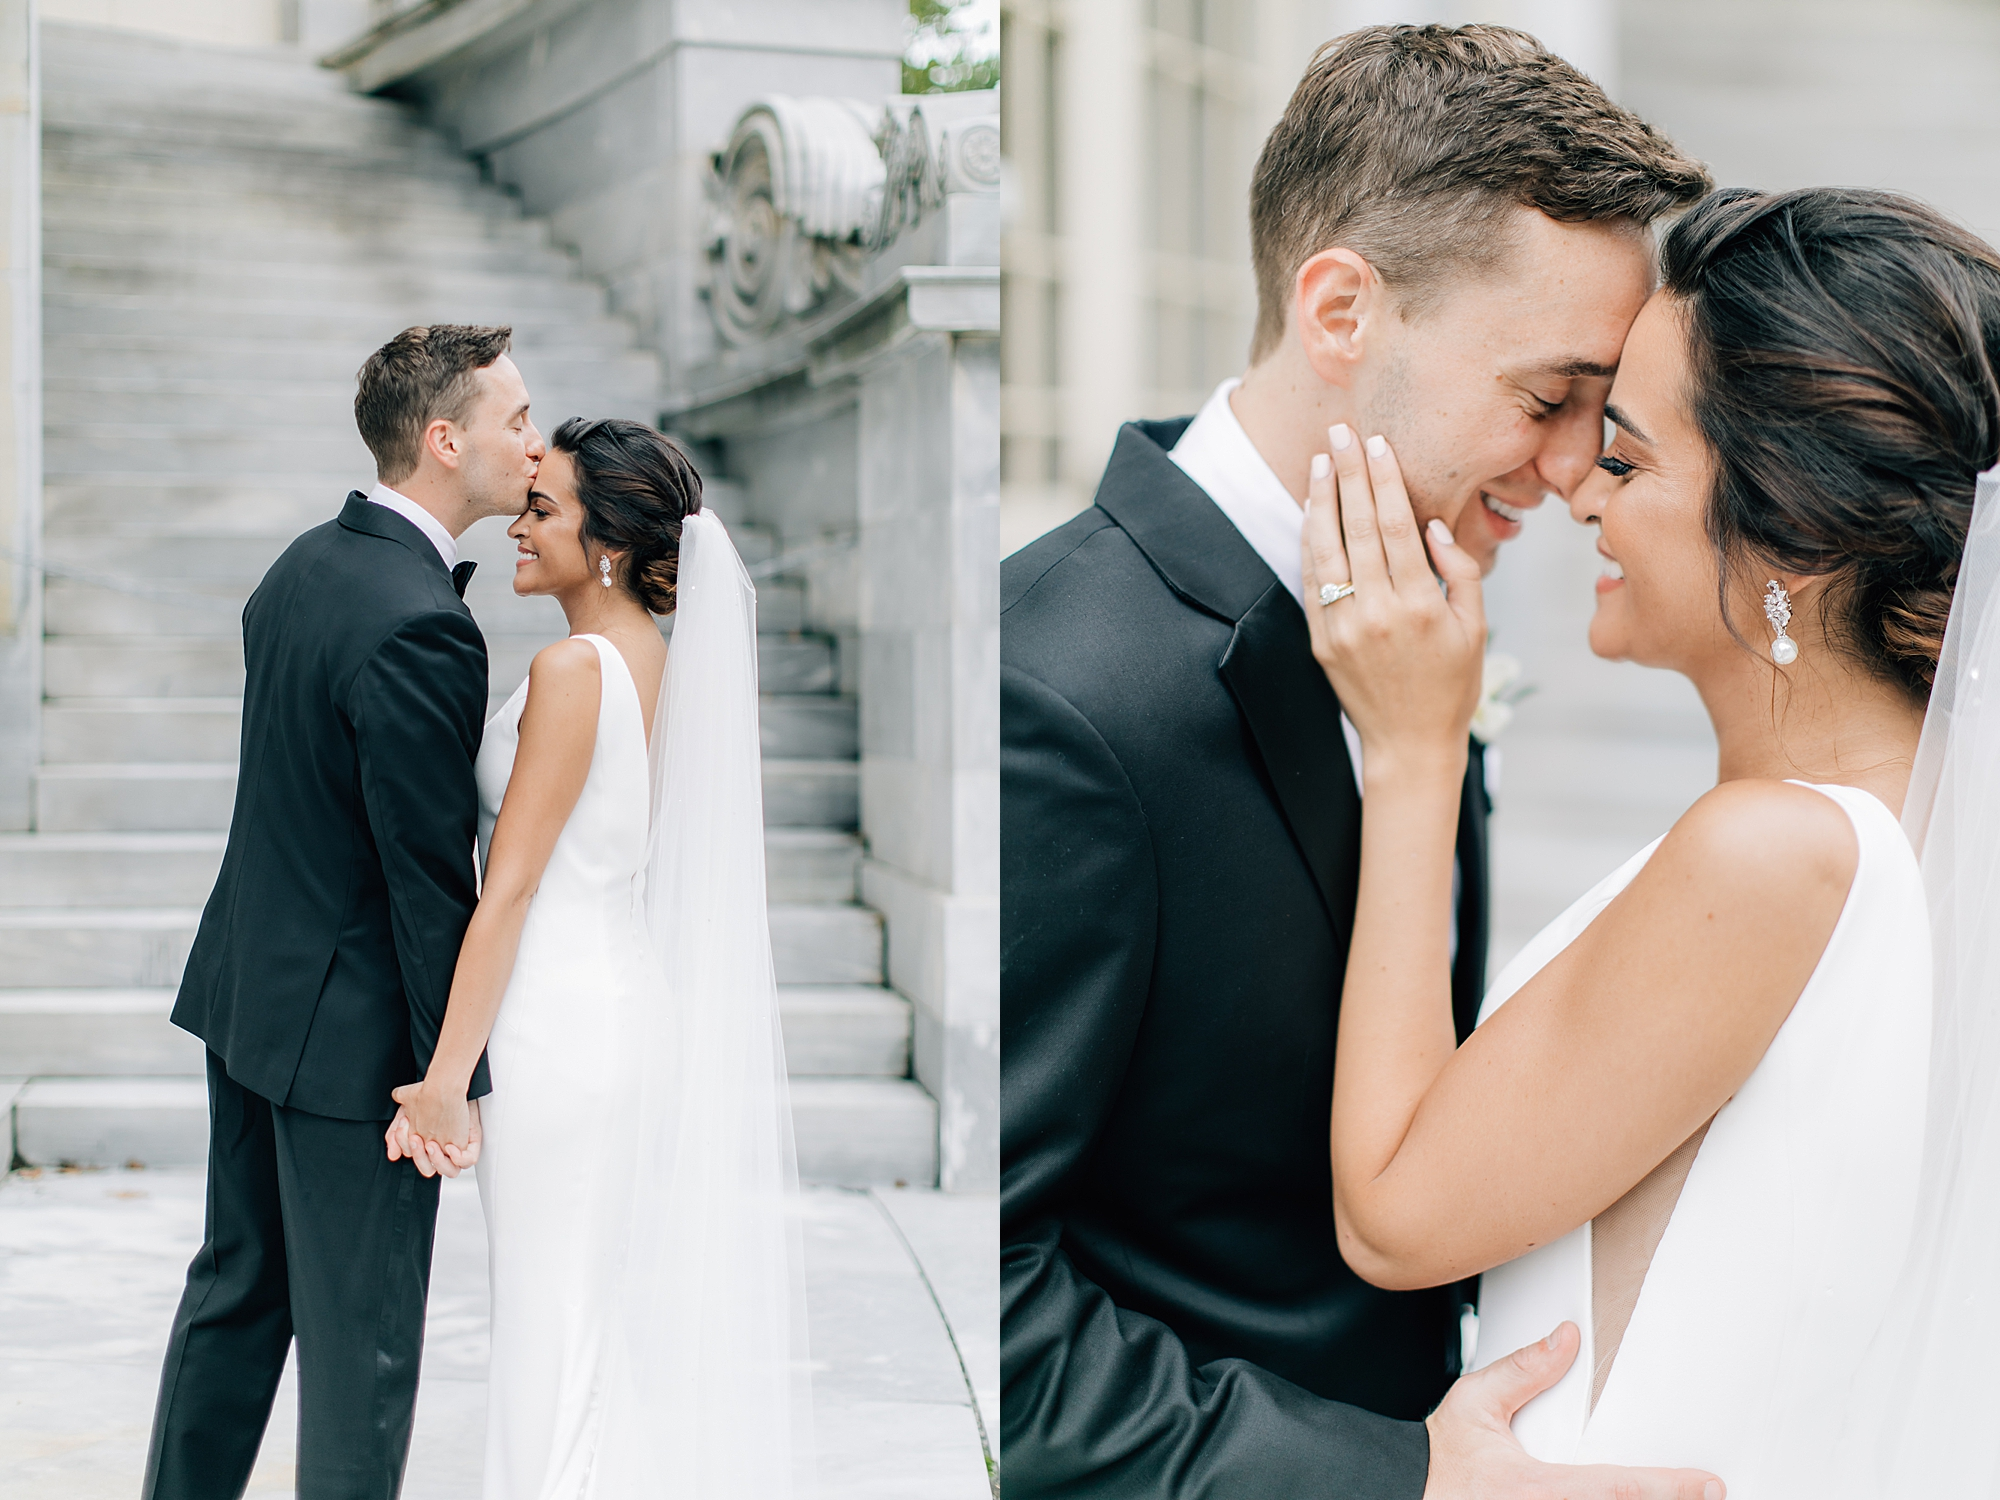 Cescaphe Philadelphia Film Wedding Photography by Magdalena Studios 37